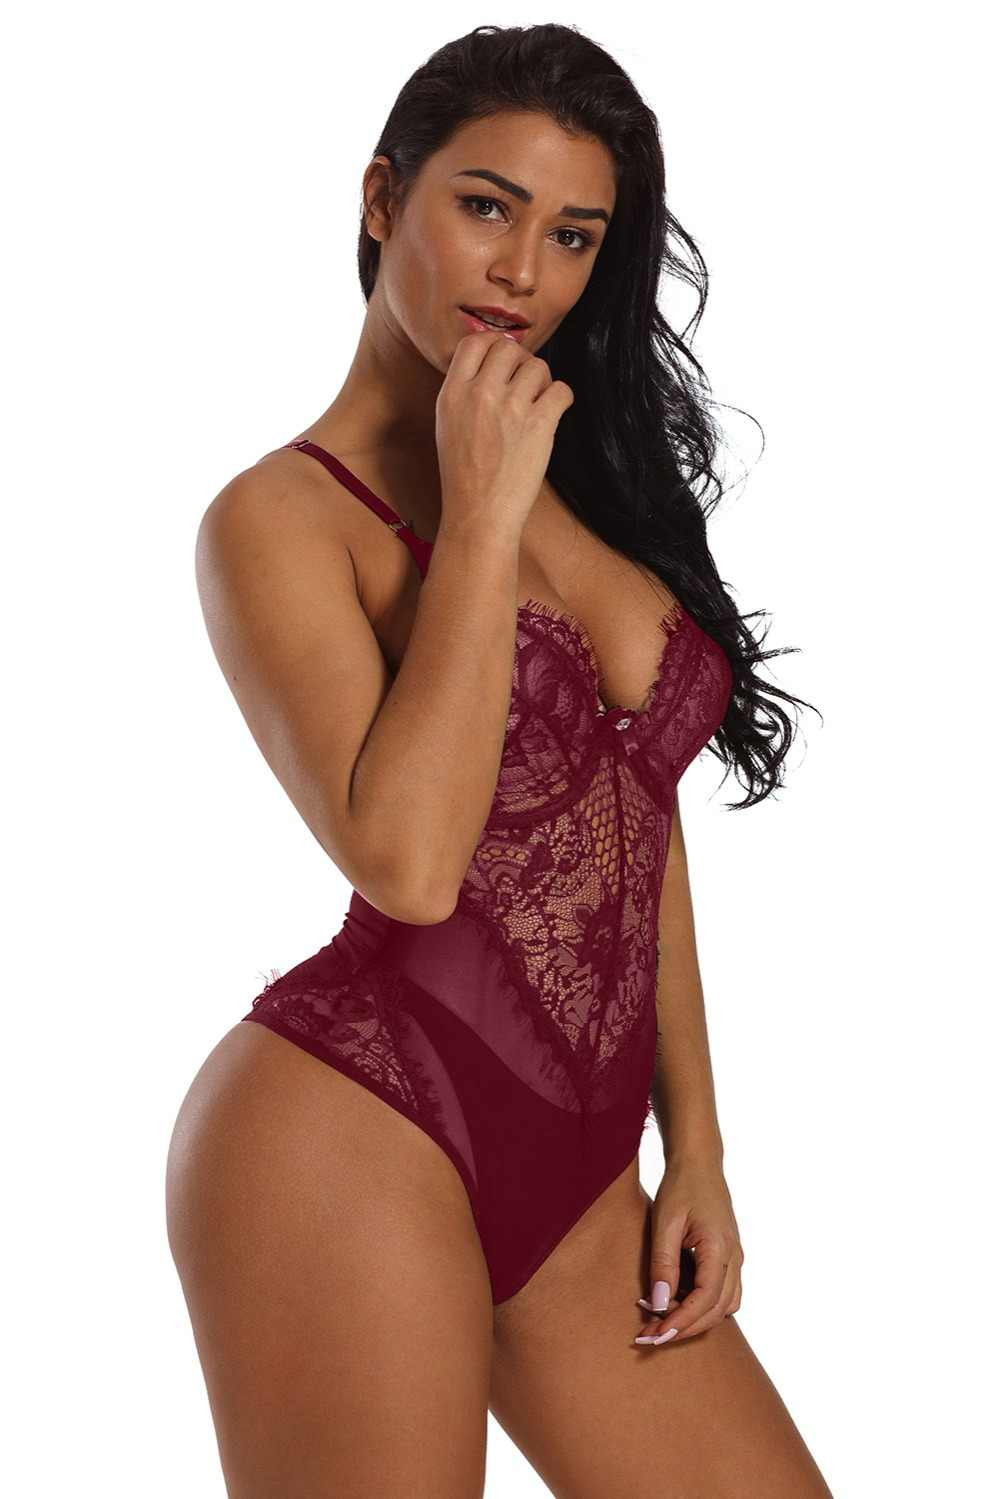 66fc39aaa08 ... Sexy Erotic Lingerie Costumes Plus Size Women s Black Sheer Mesh Lace  Cupped Teddy Lingerie Sleepwear Underwears ...